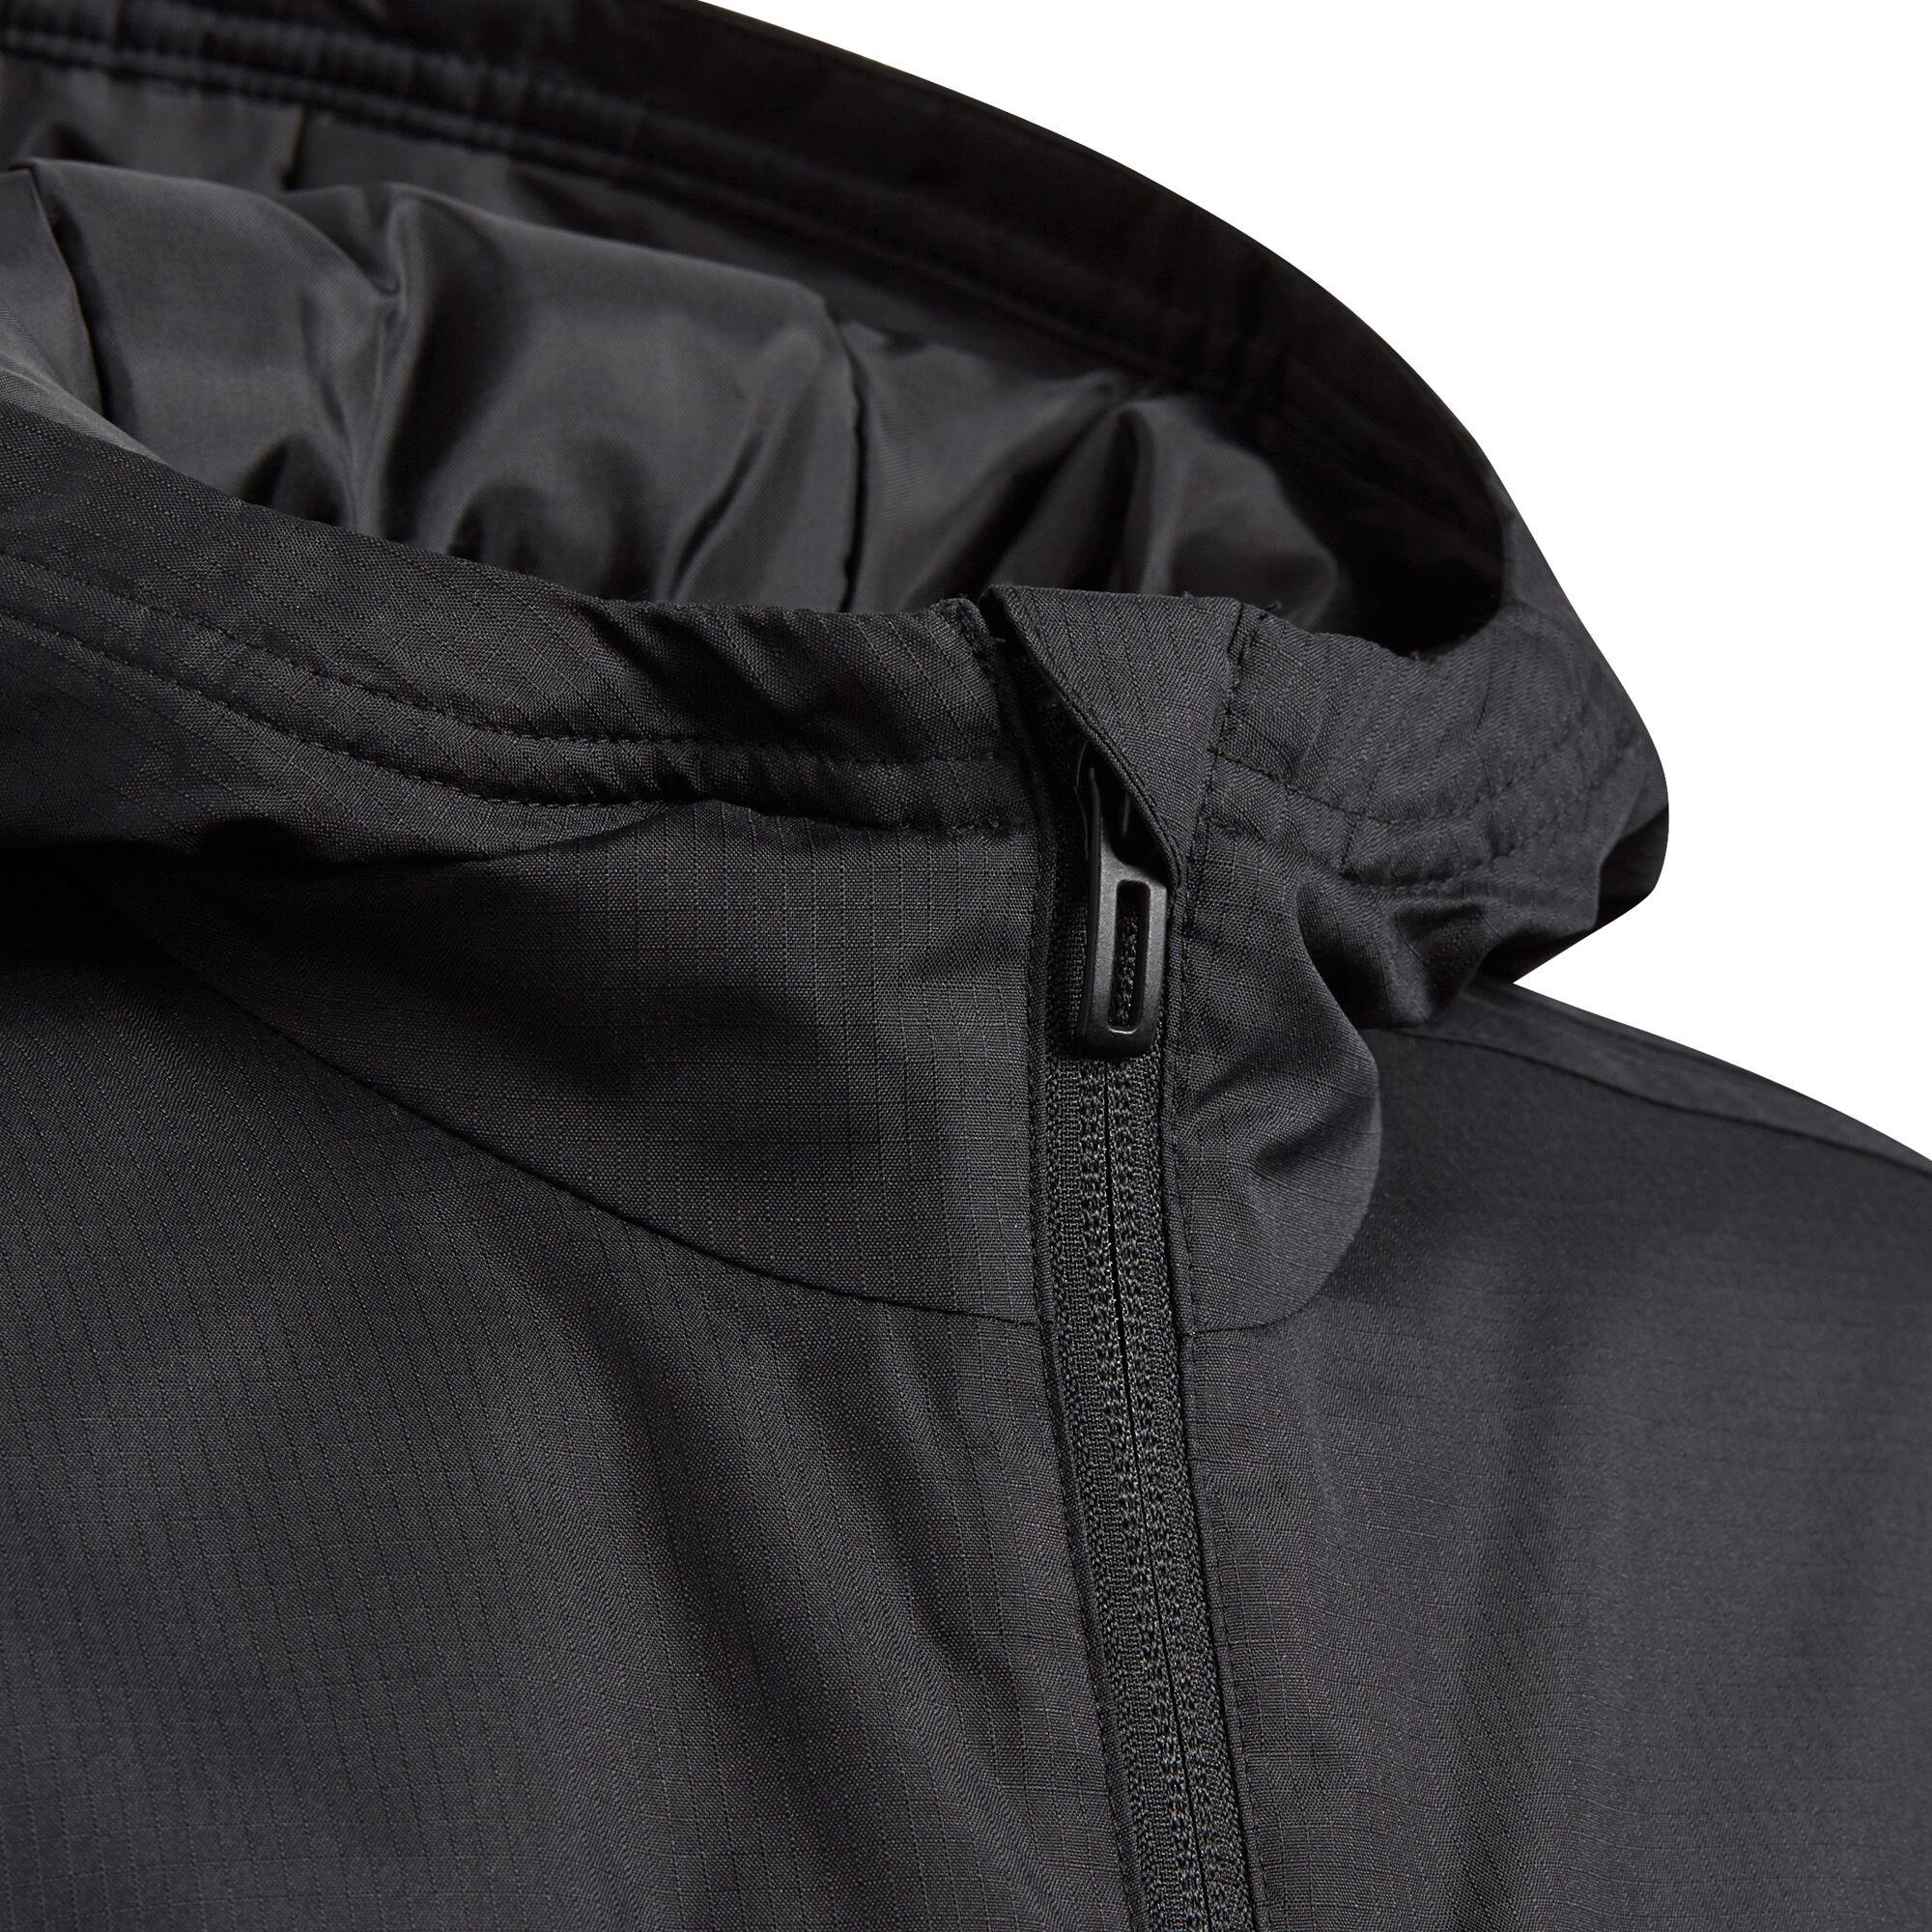 adidas Winter Jacket 18 vattert jakke junior   Intersport